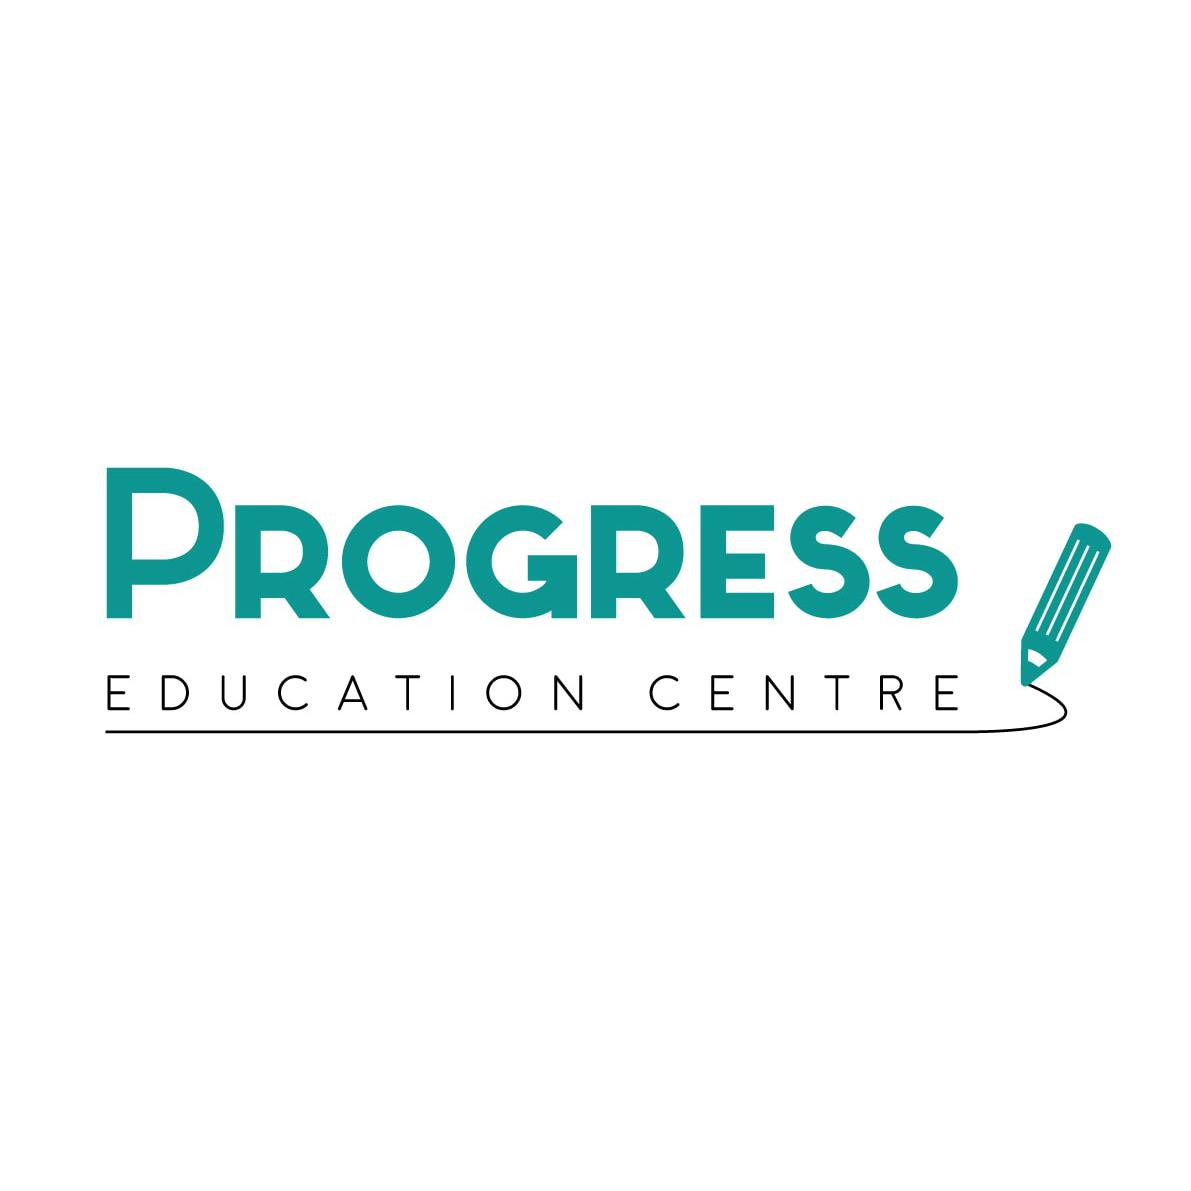 Progress Education Centre - Darwen, Lancashire BB3 1QU - 01254 701700 | ShowMeLocal.com